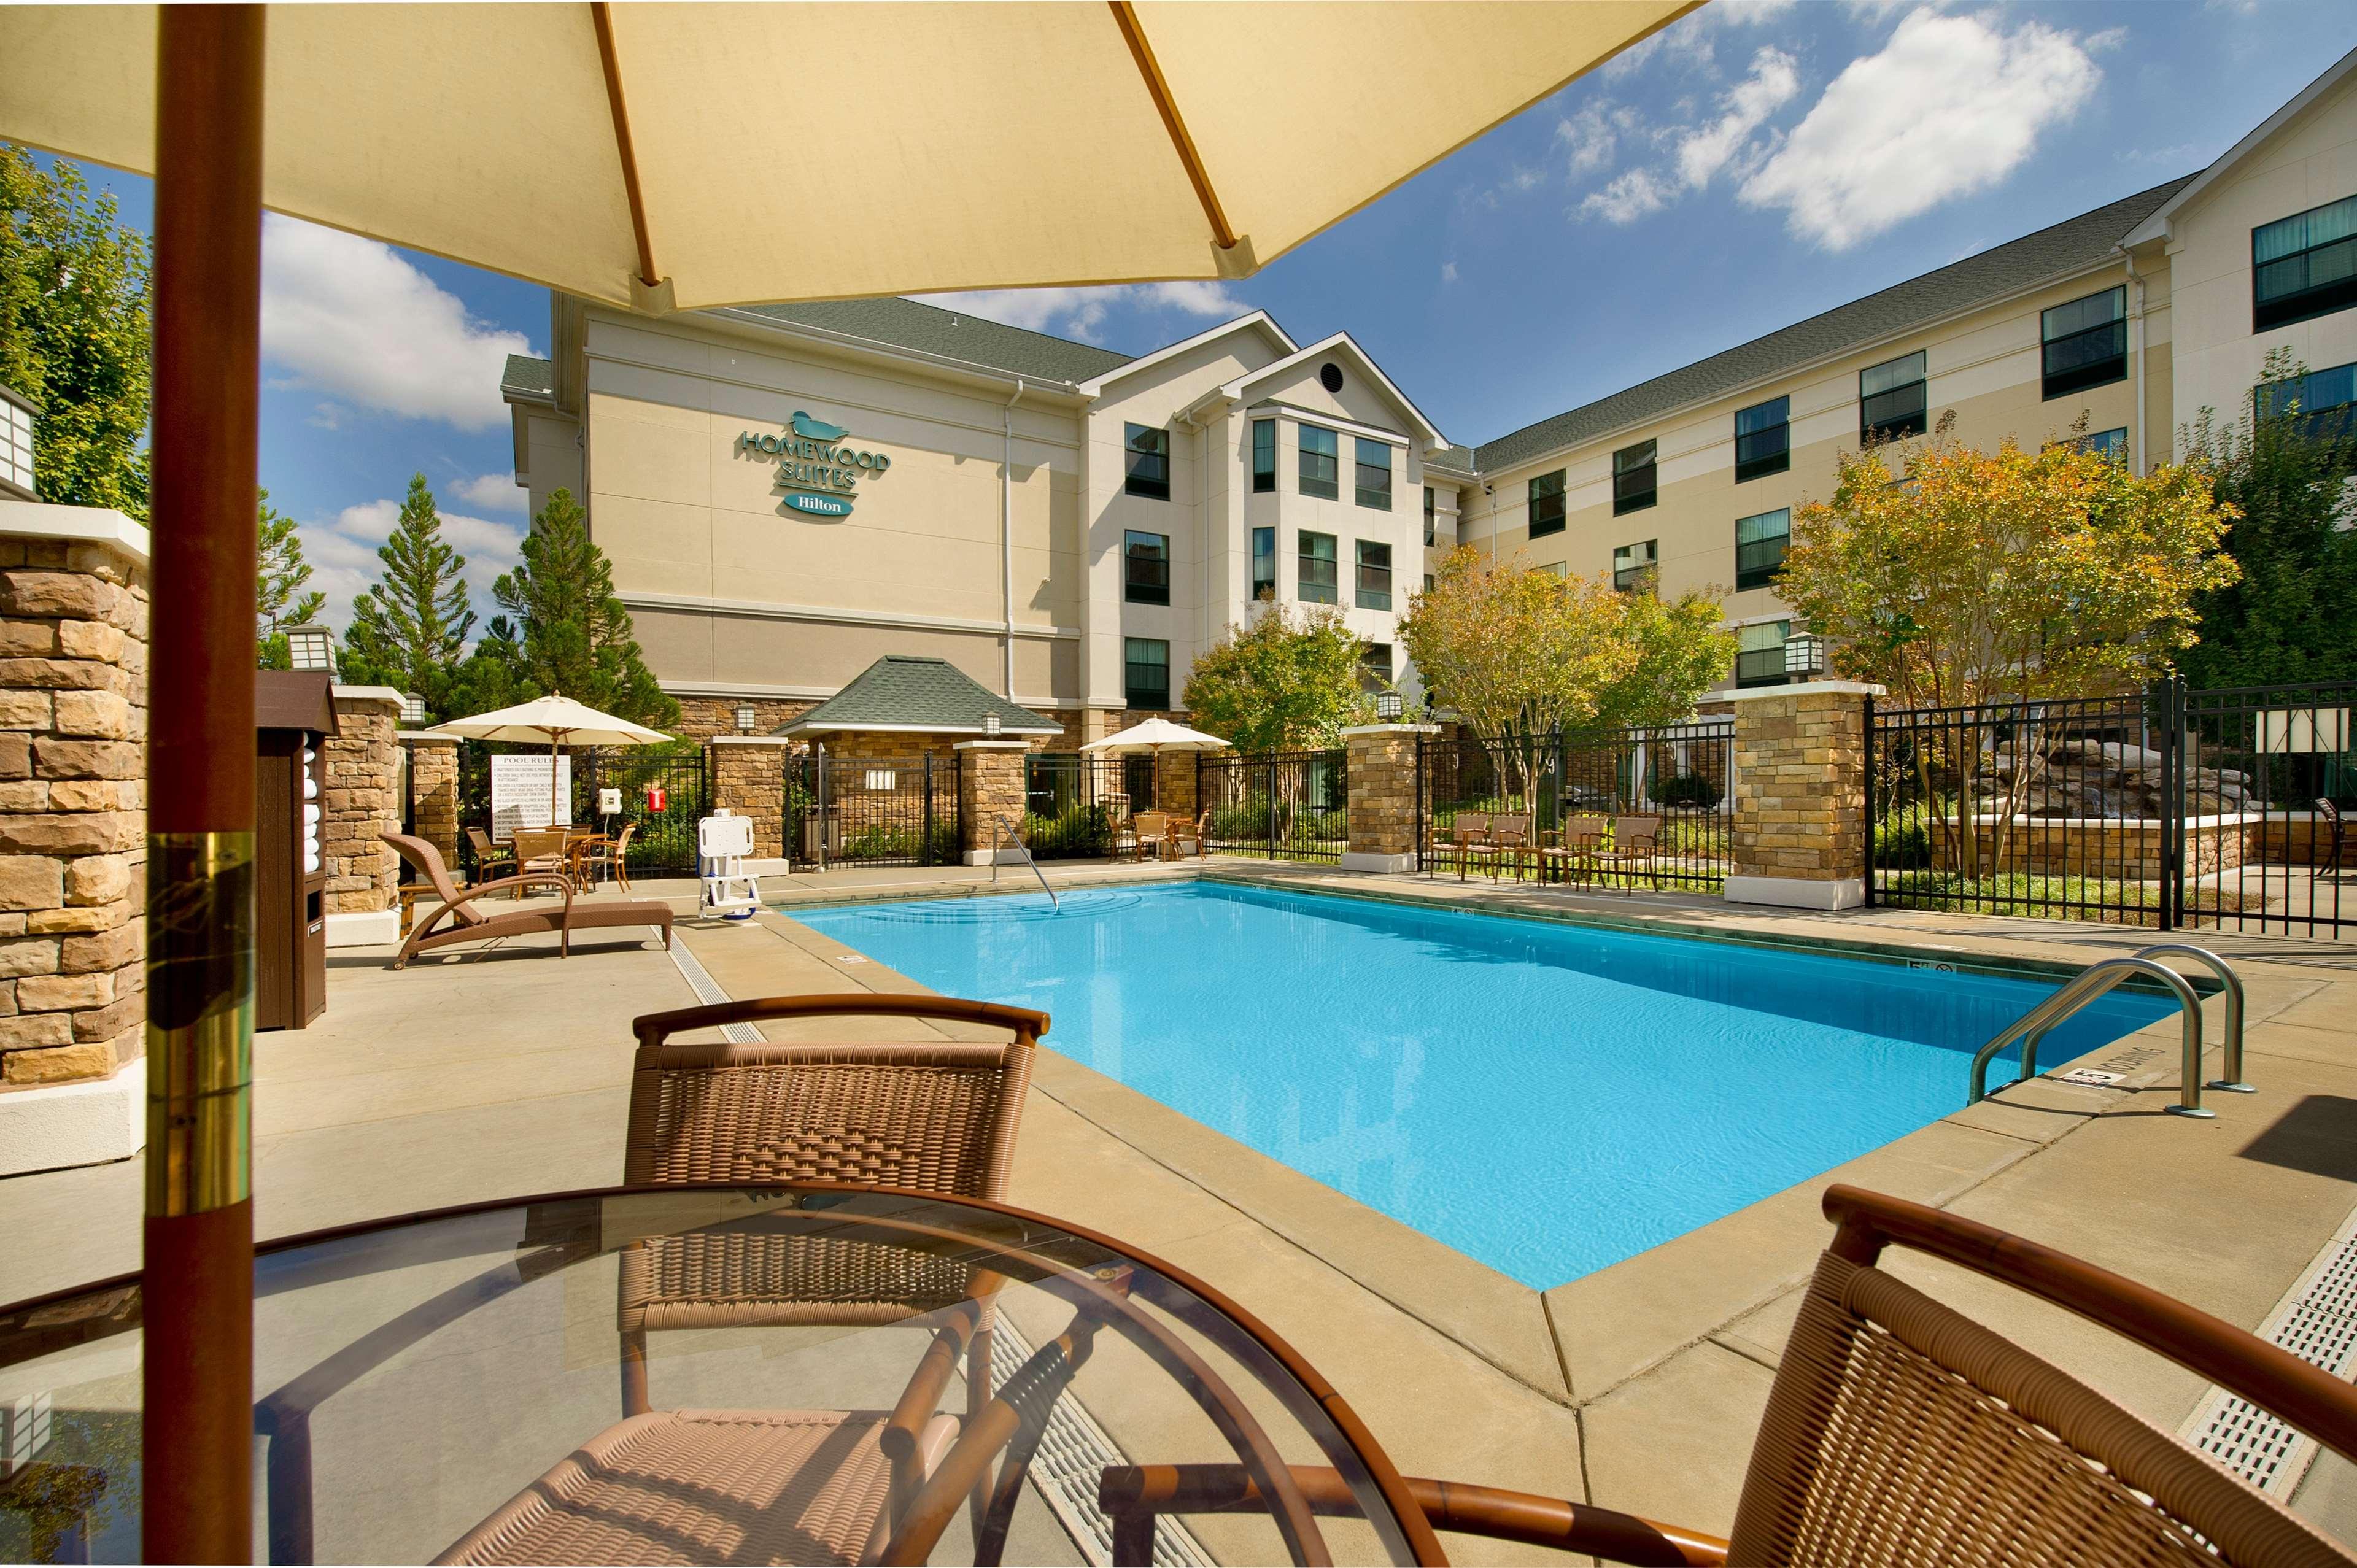 Homewood Suites by Hilton Columbus image 8